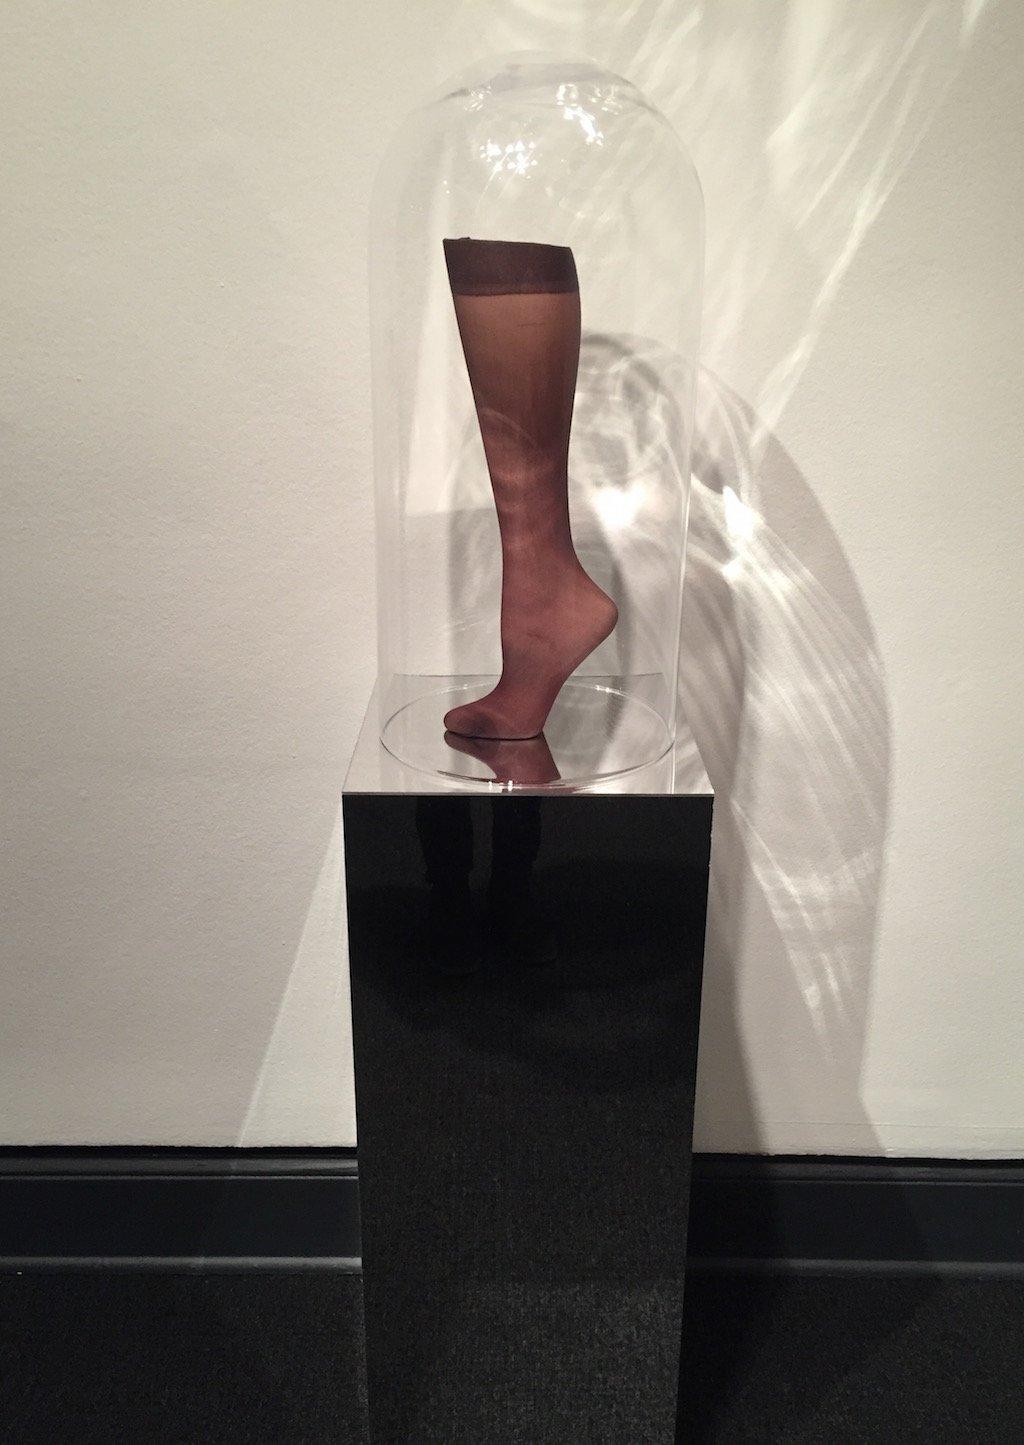 Josephine McKenner's American Leg